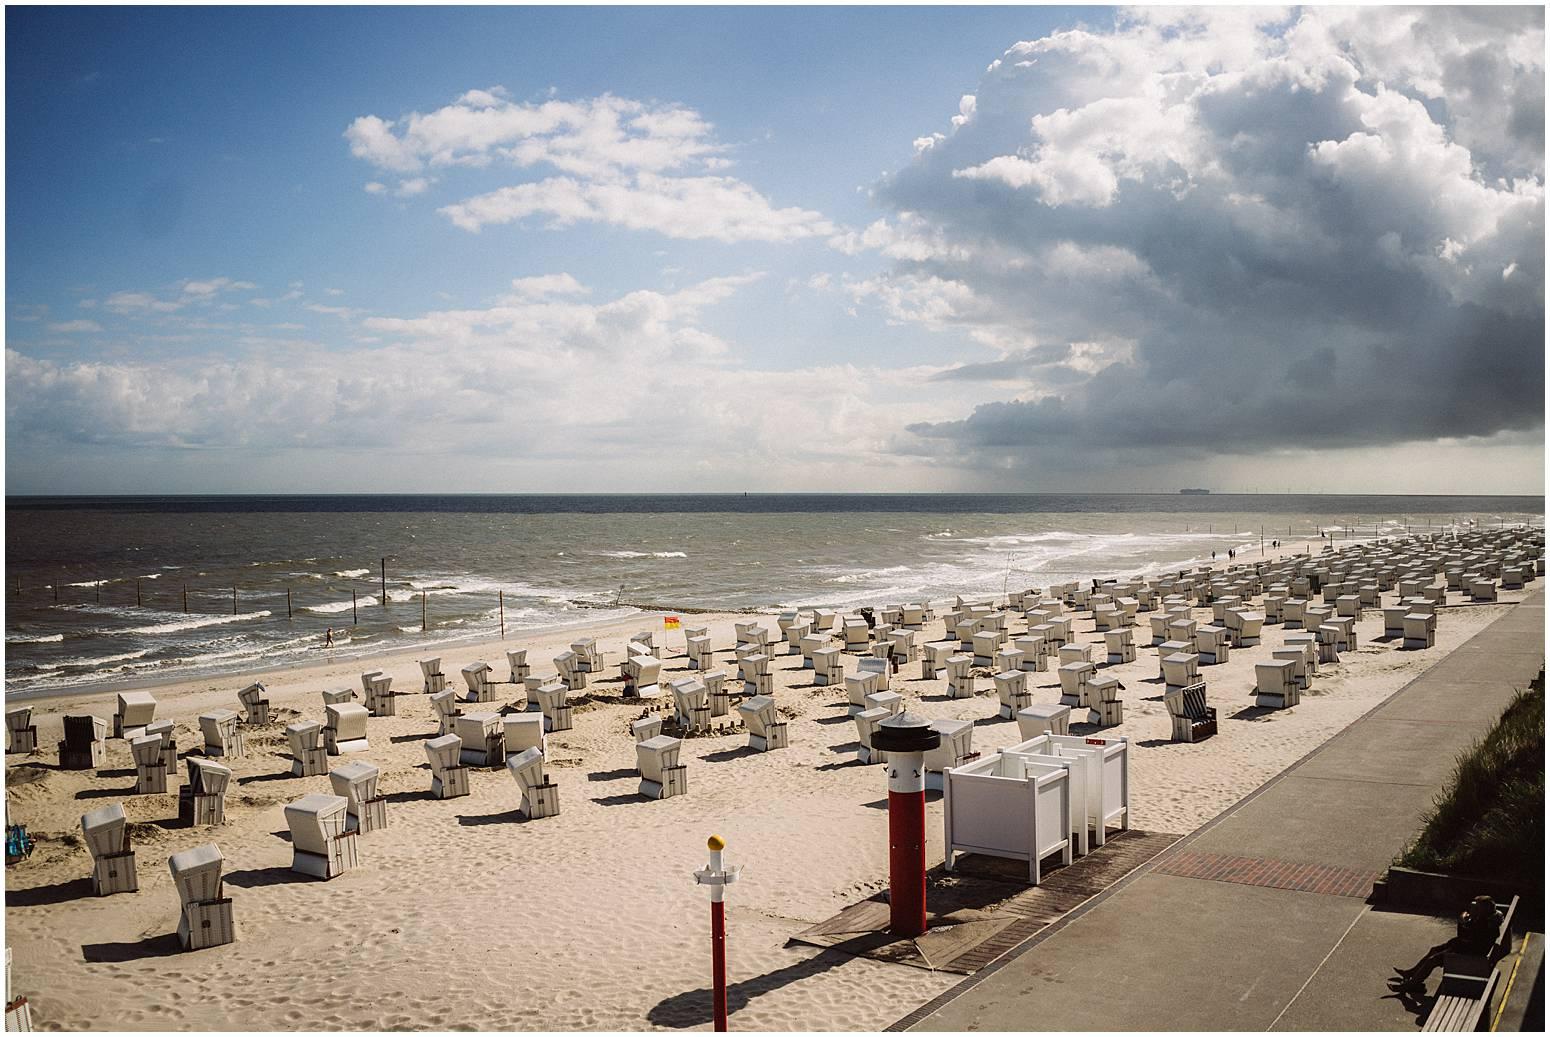 Strandpromenade auf Wangerooge